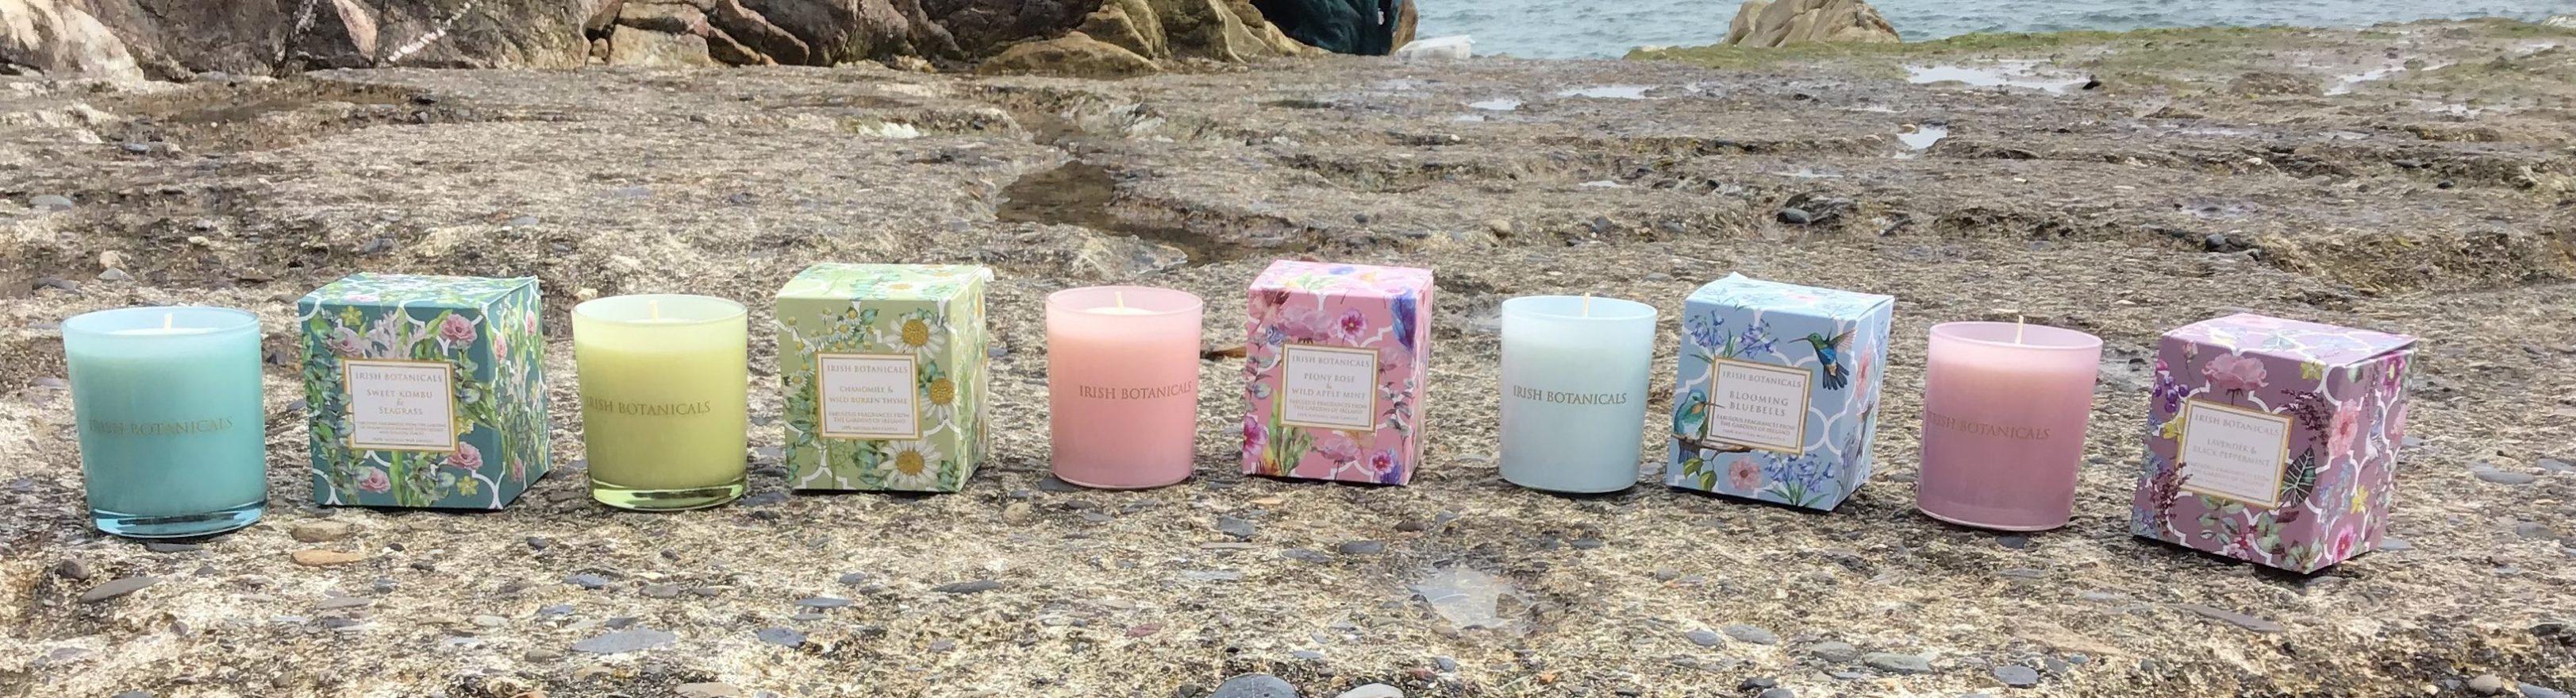 Irish Botanicals candle jars on beach